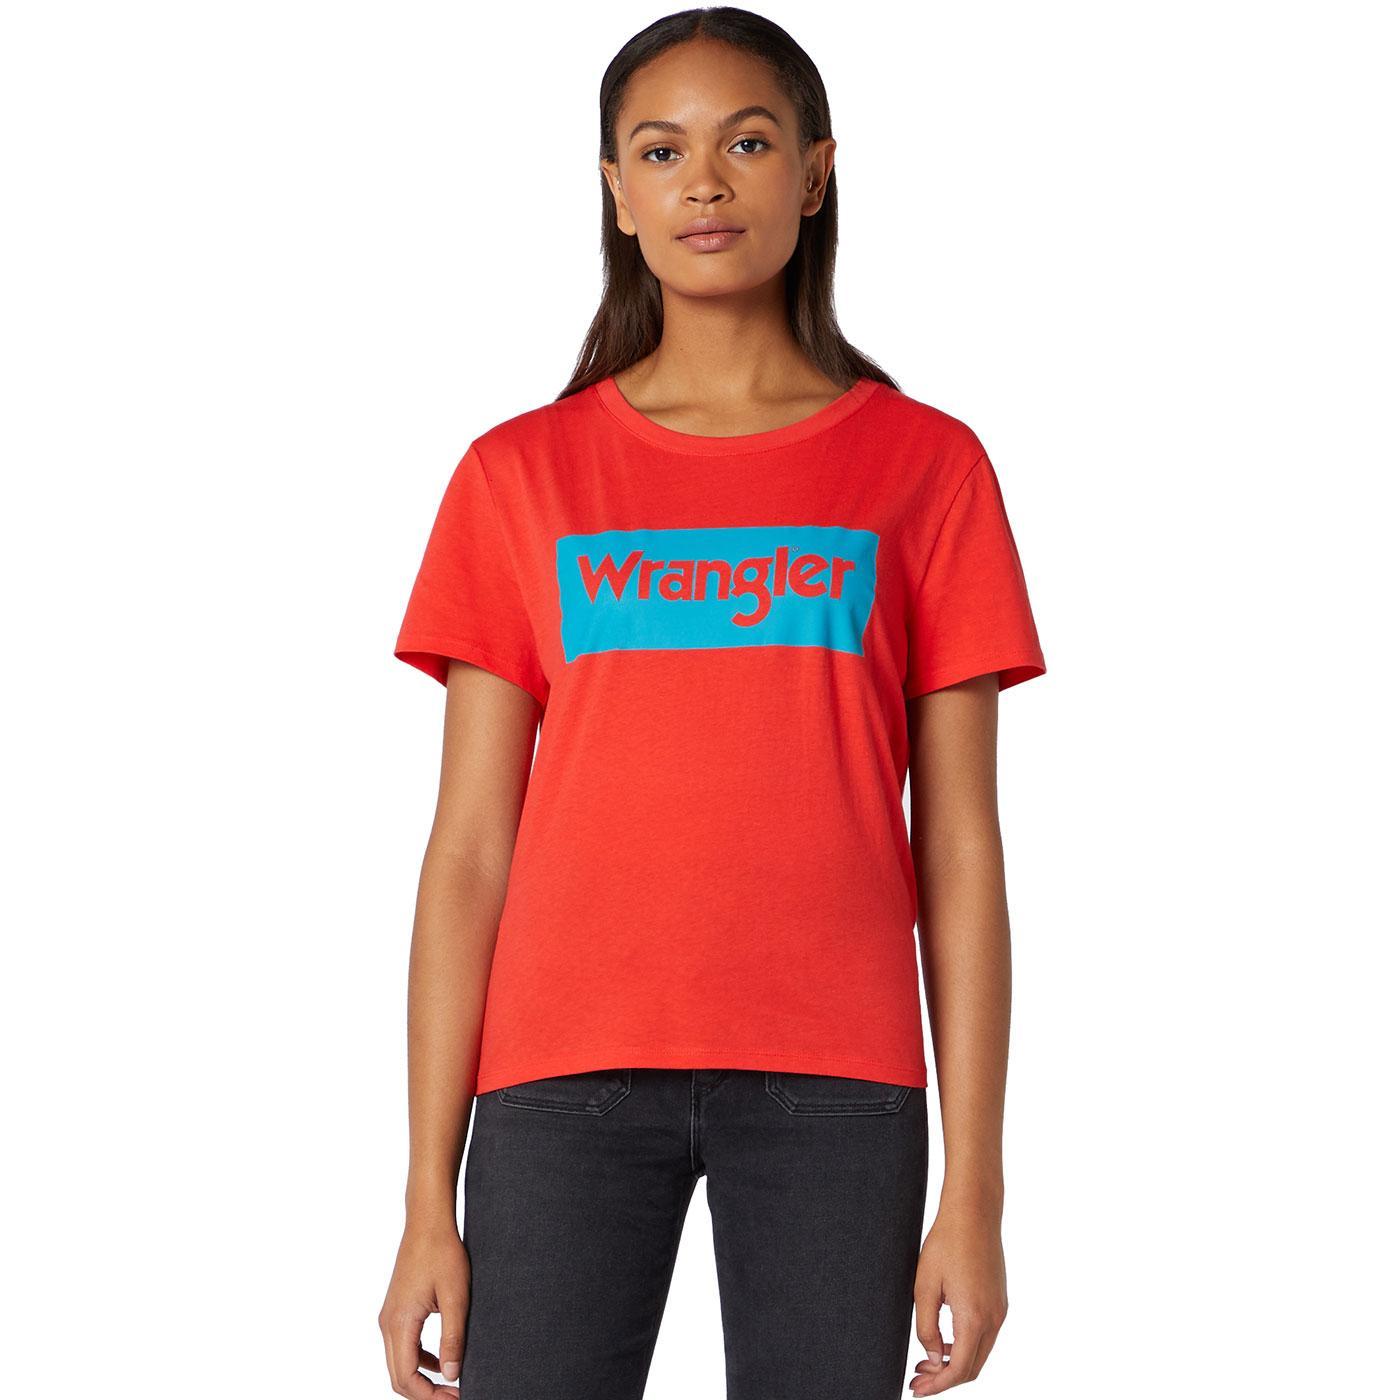 WRANGLER Women's Bold Retro Logo T-Shirt RED